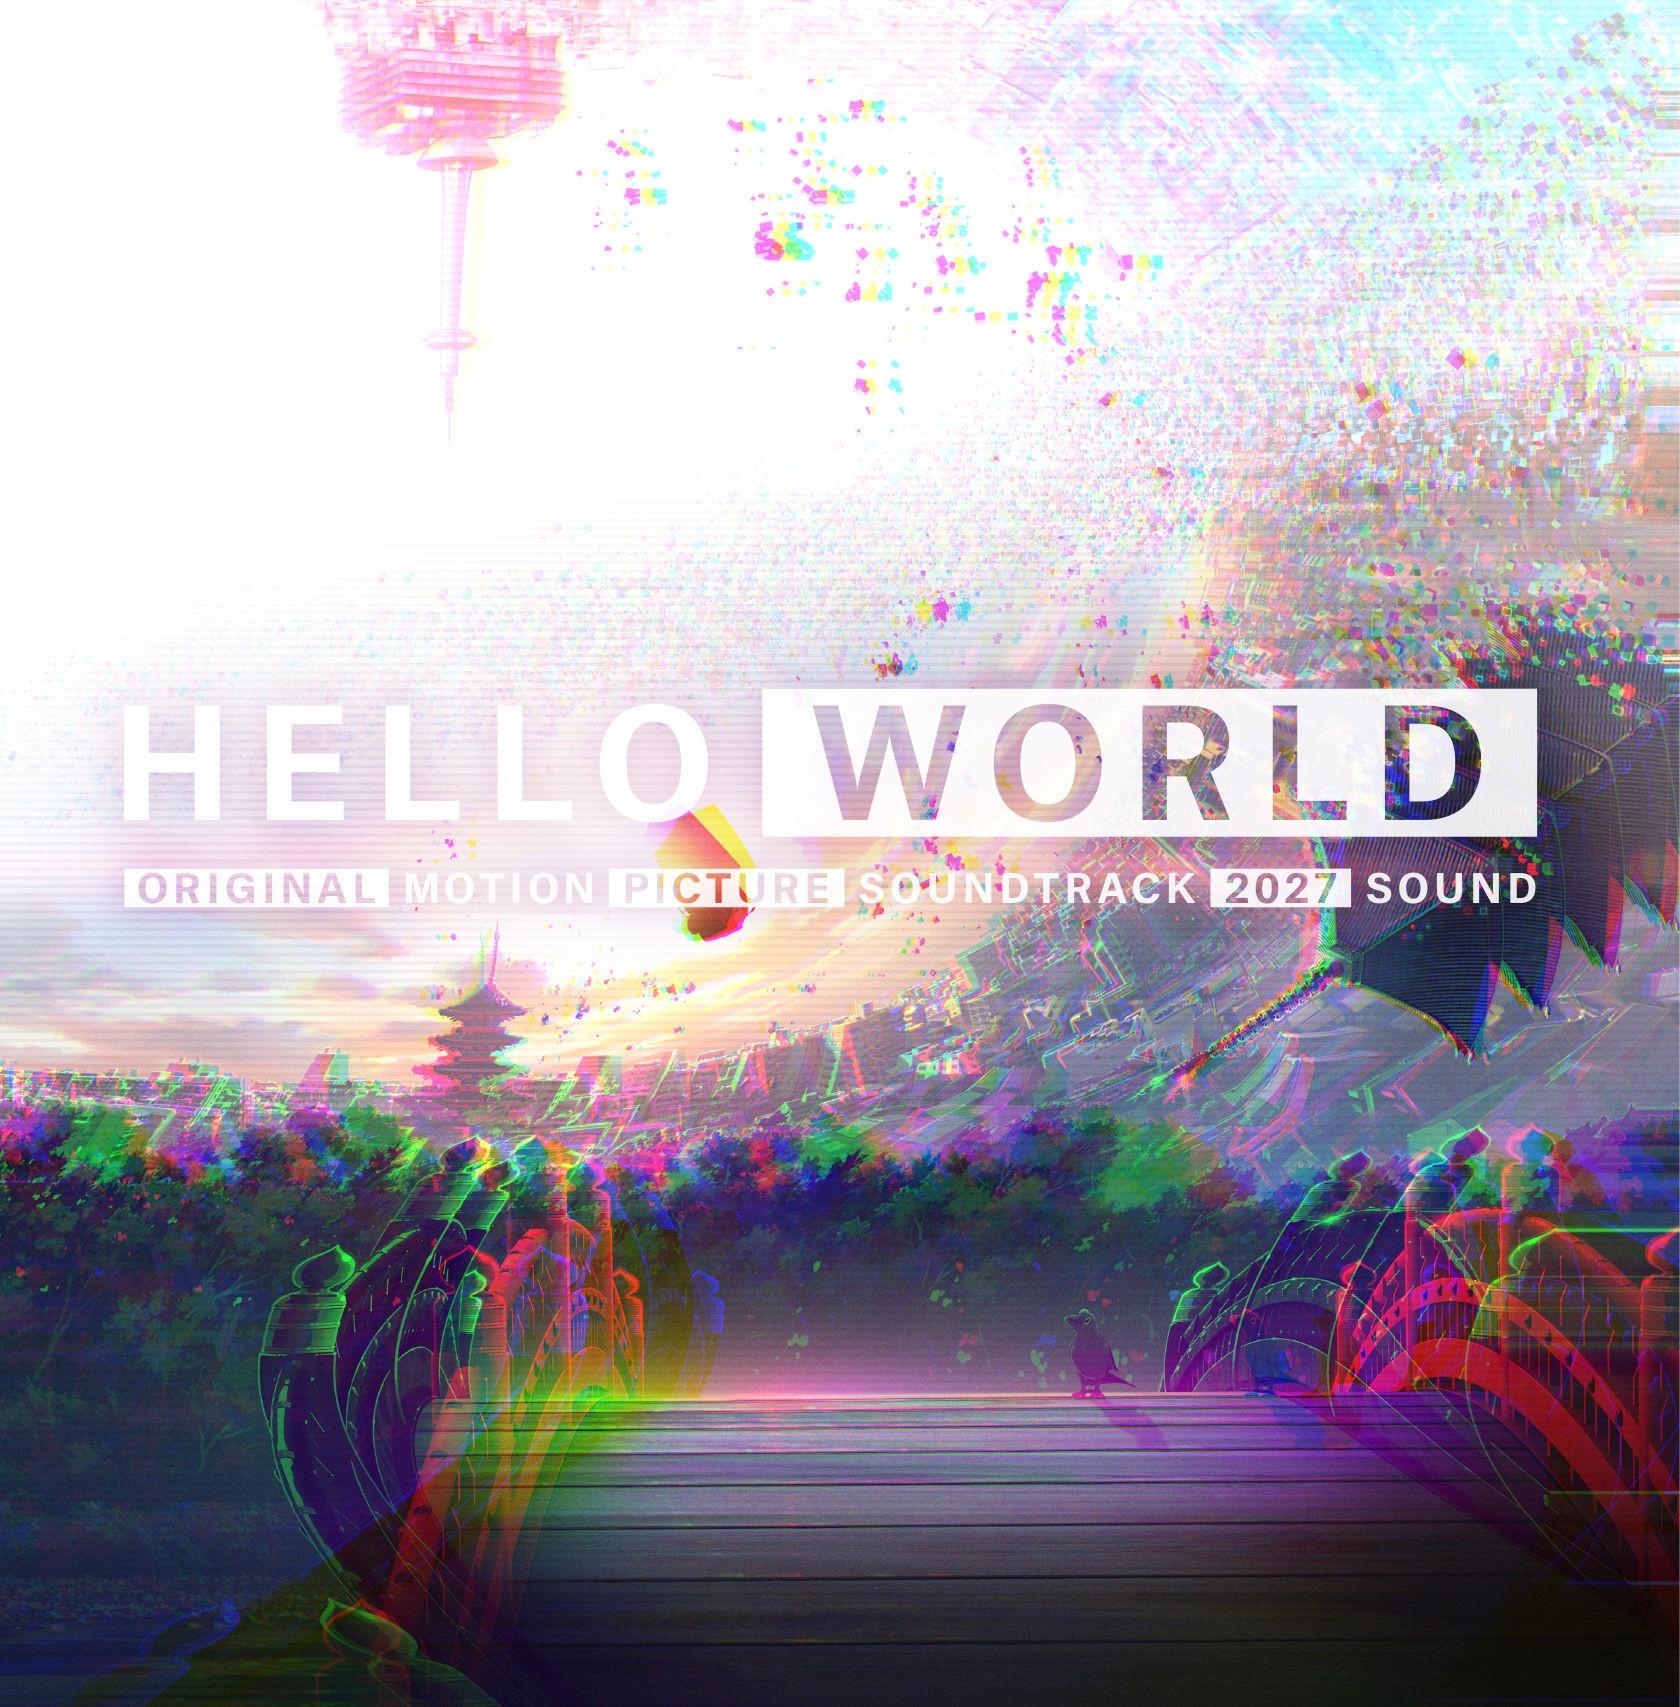 2027Sound – HELLO WORLD ORIGINAL MOTION PICTURE SOUNDTRACK [FLAC 24bit/96kHz]